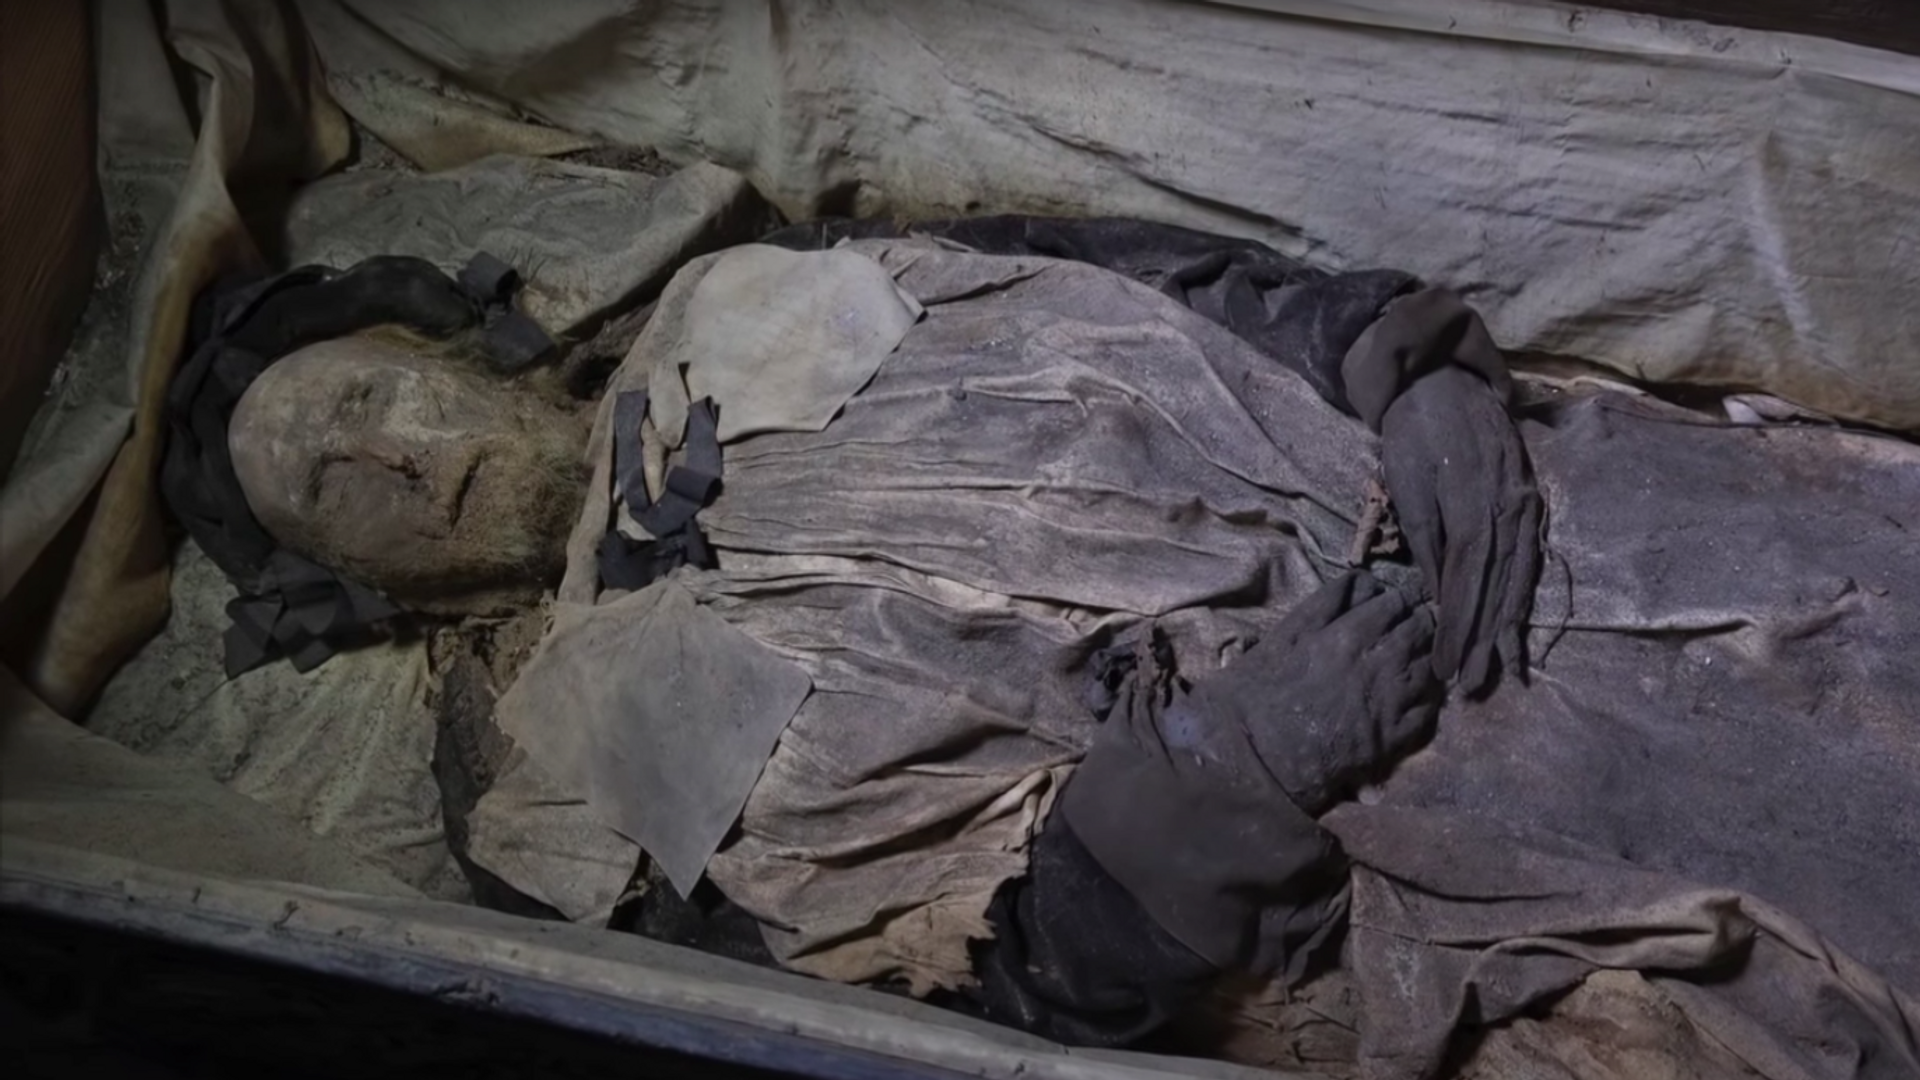 La momia del obispo Peder Winstrup - Sputnik Mundo, 1920, 10.04.2021